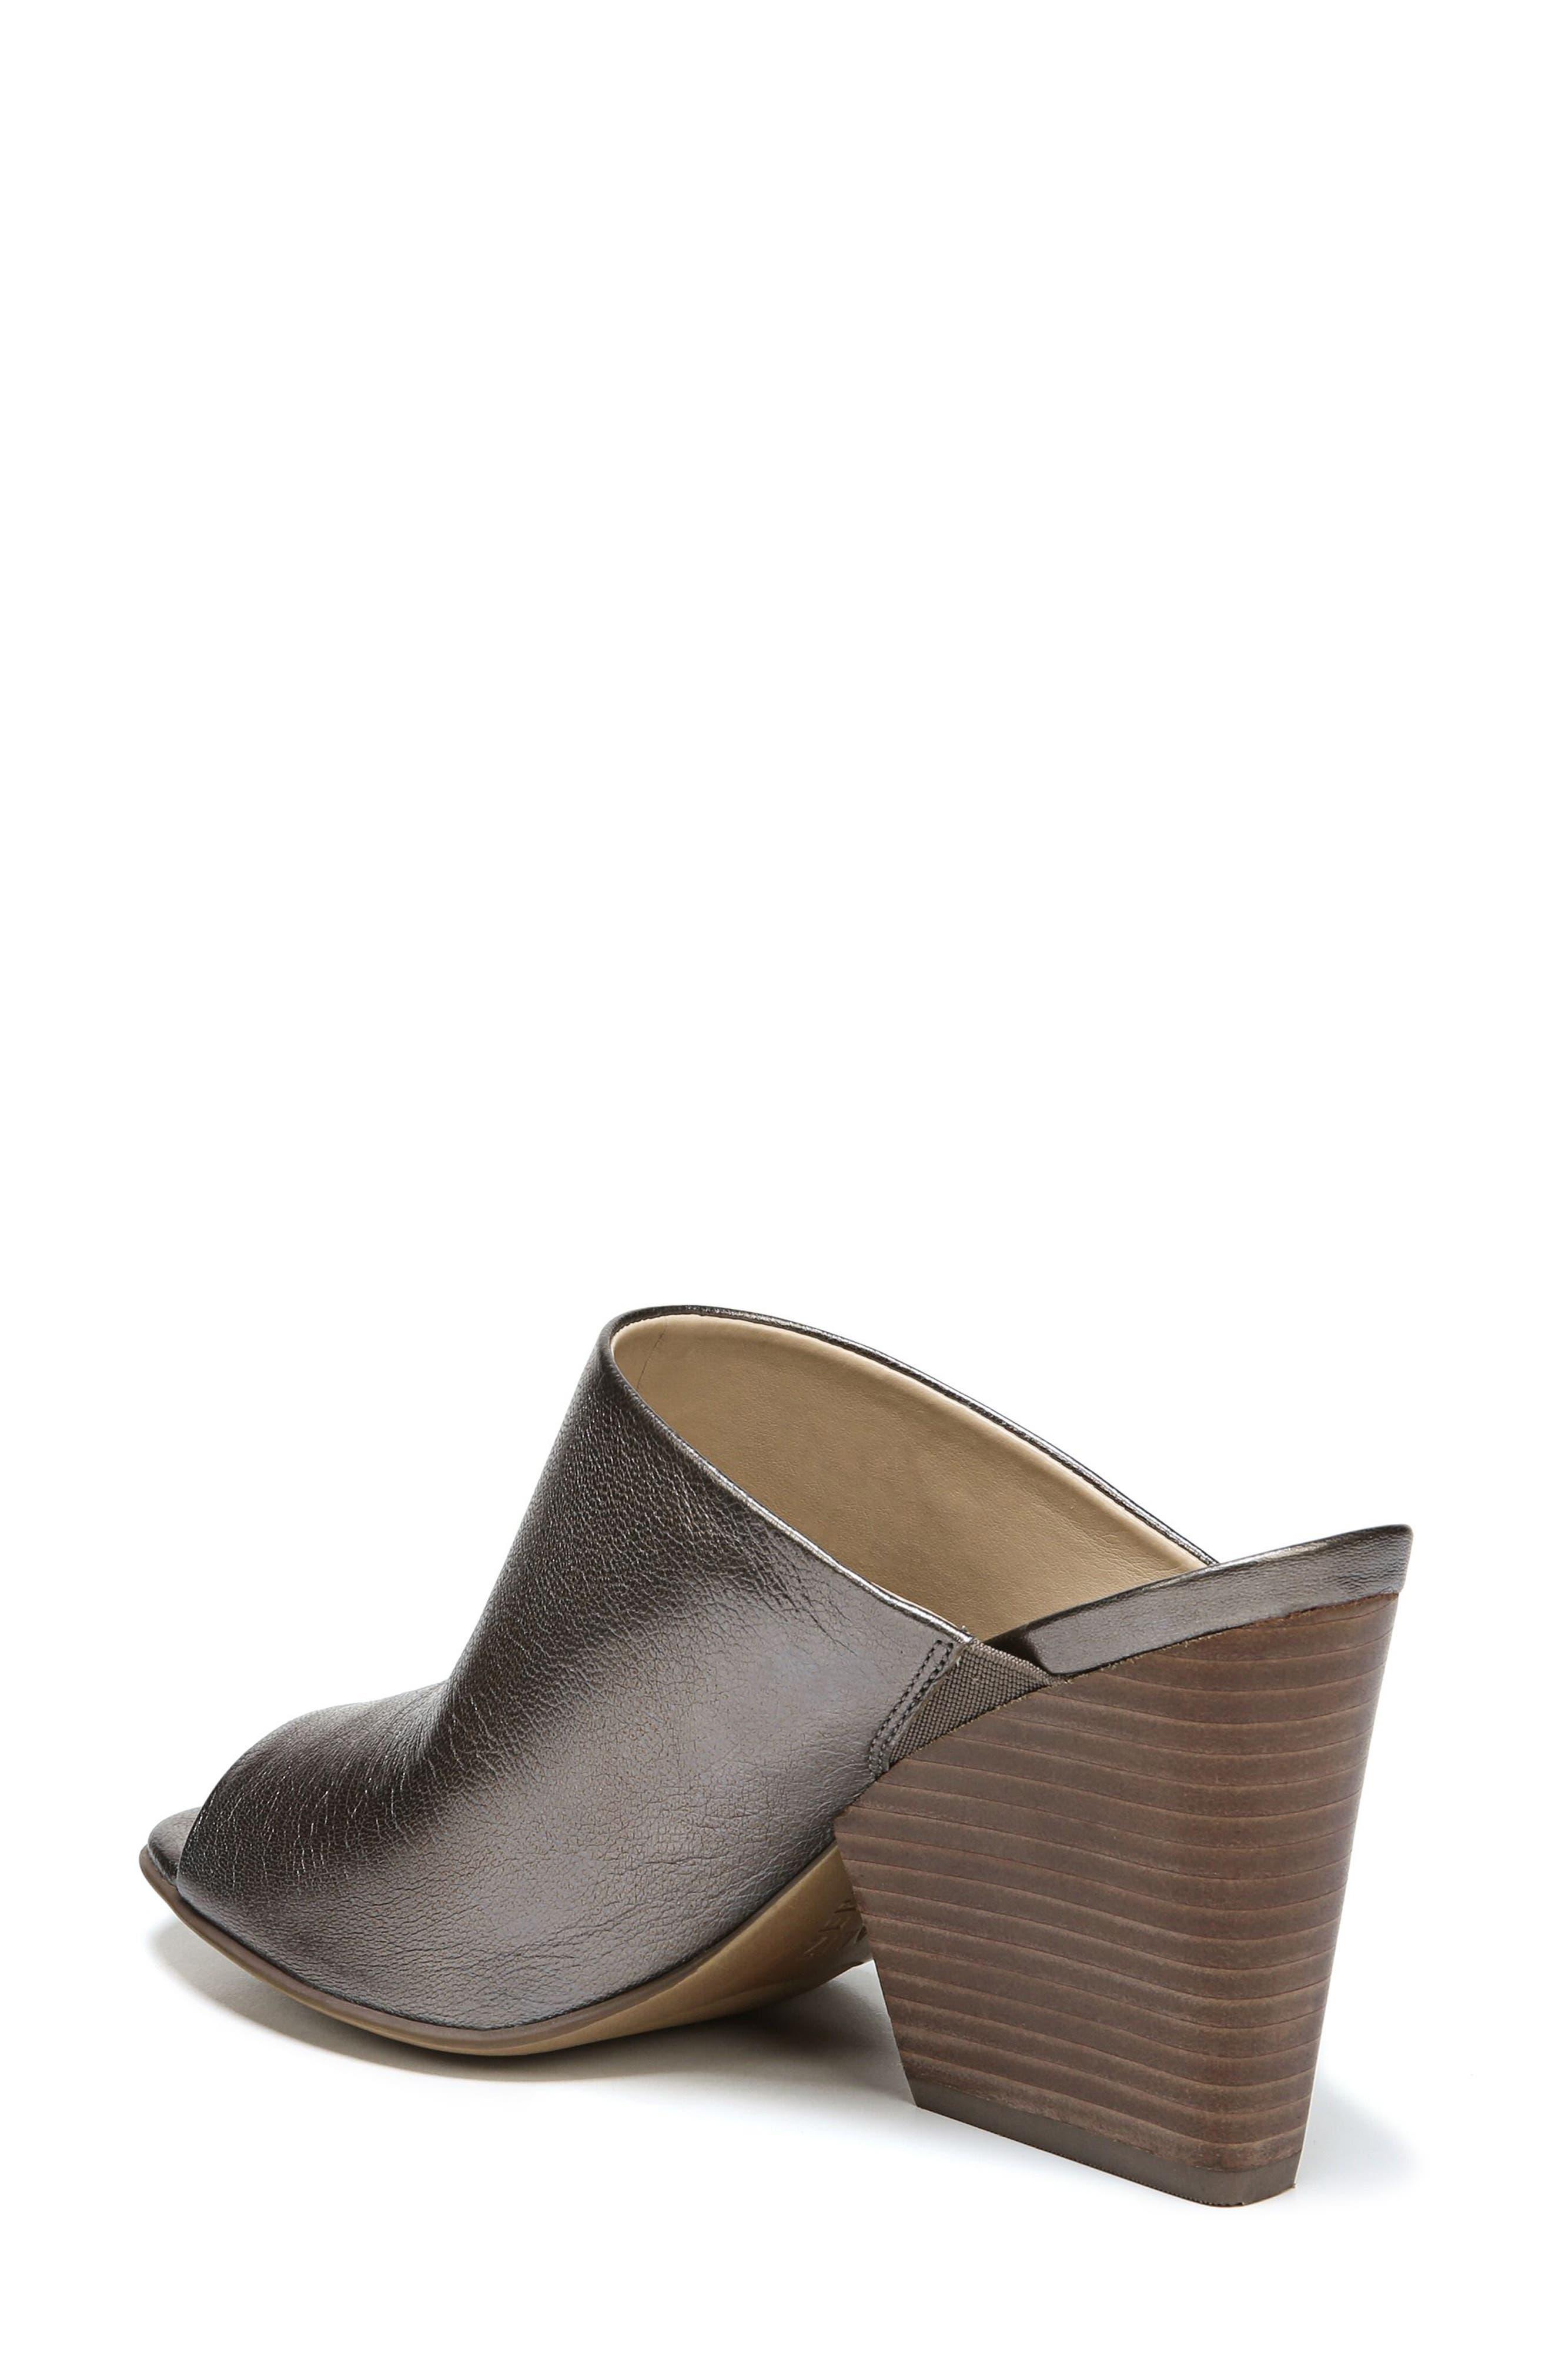 Sloan Sandal,                             Alternate thumbnail 2, color,                             Gunmetal Leather